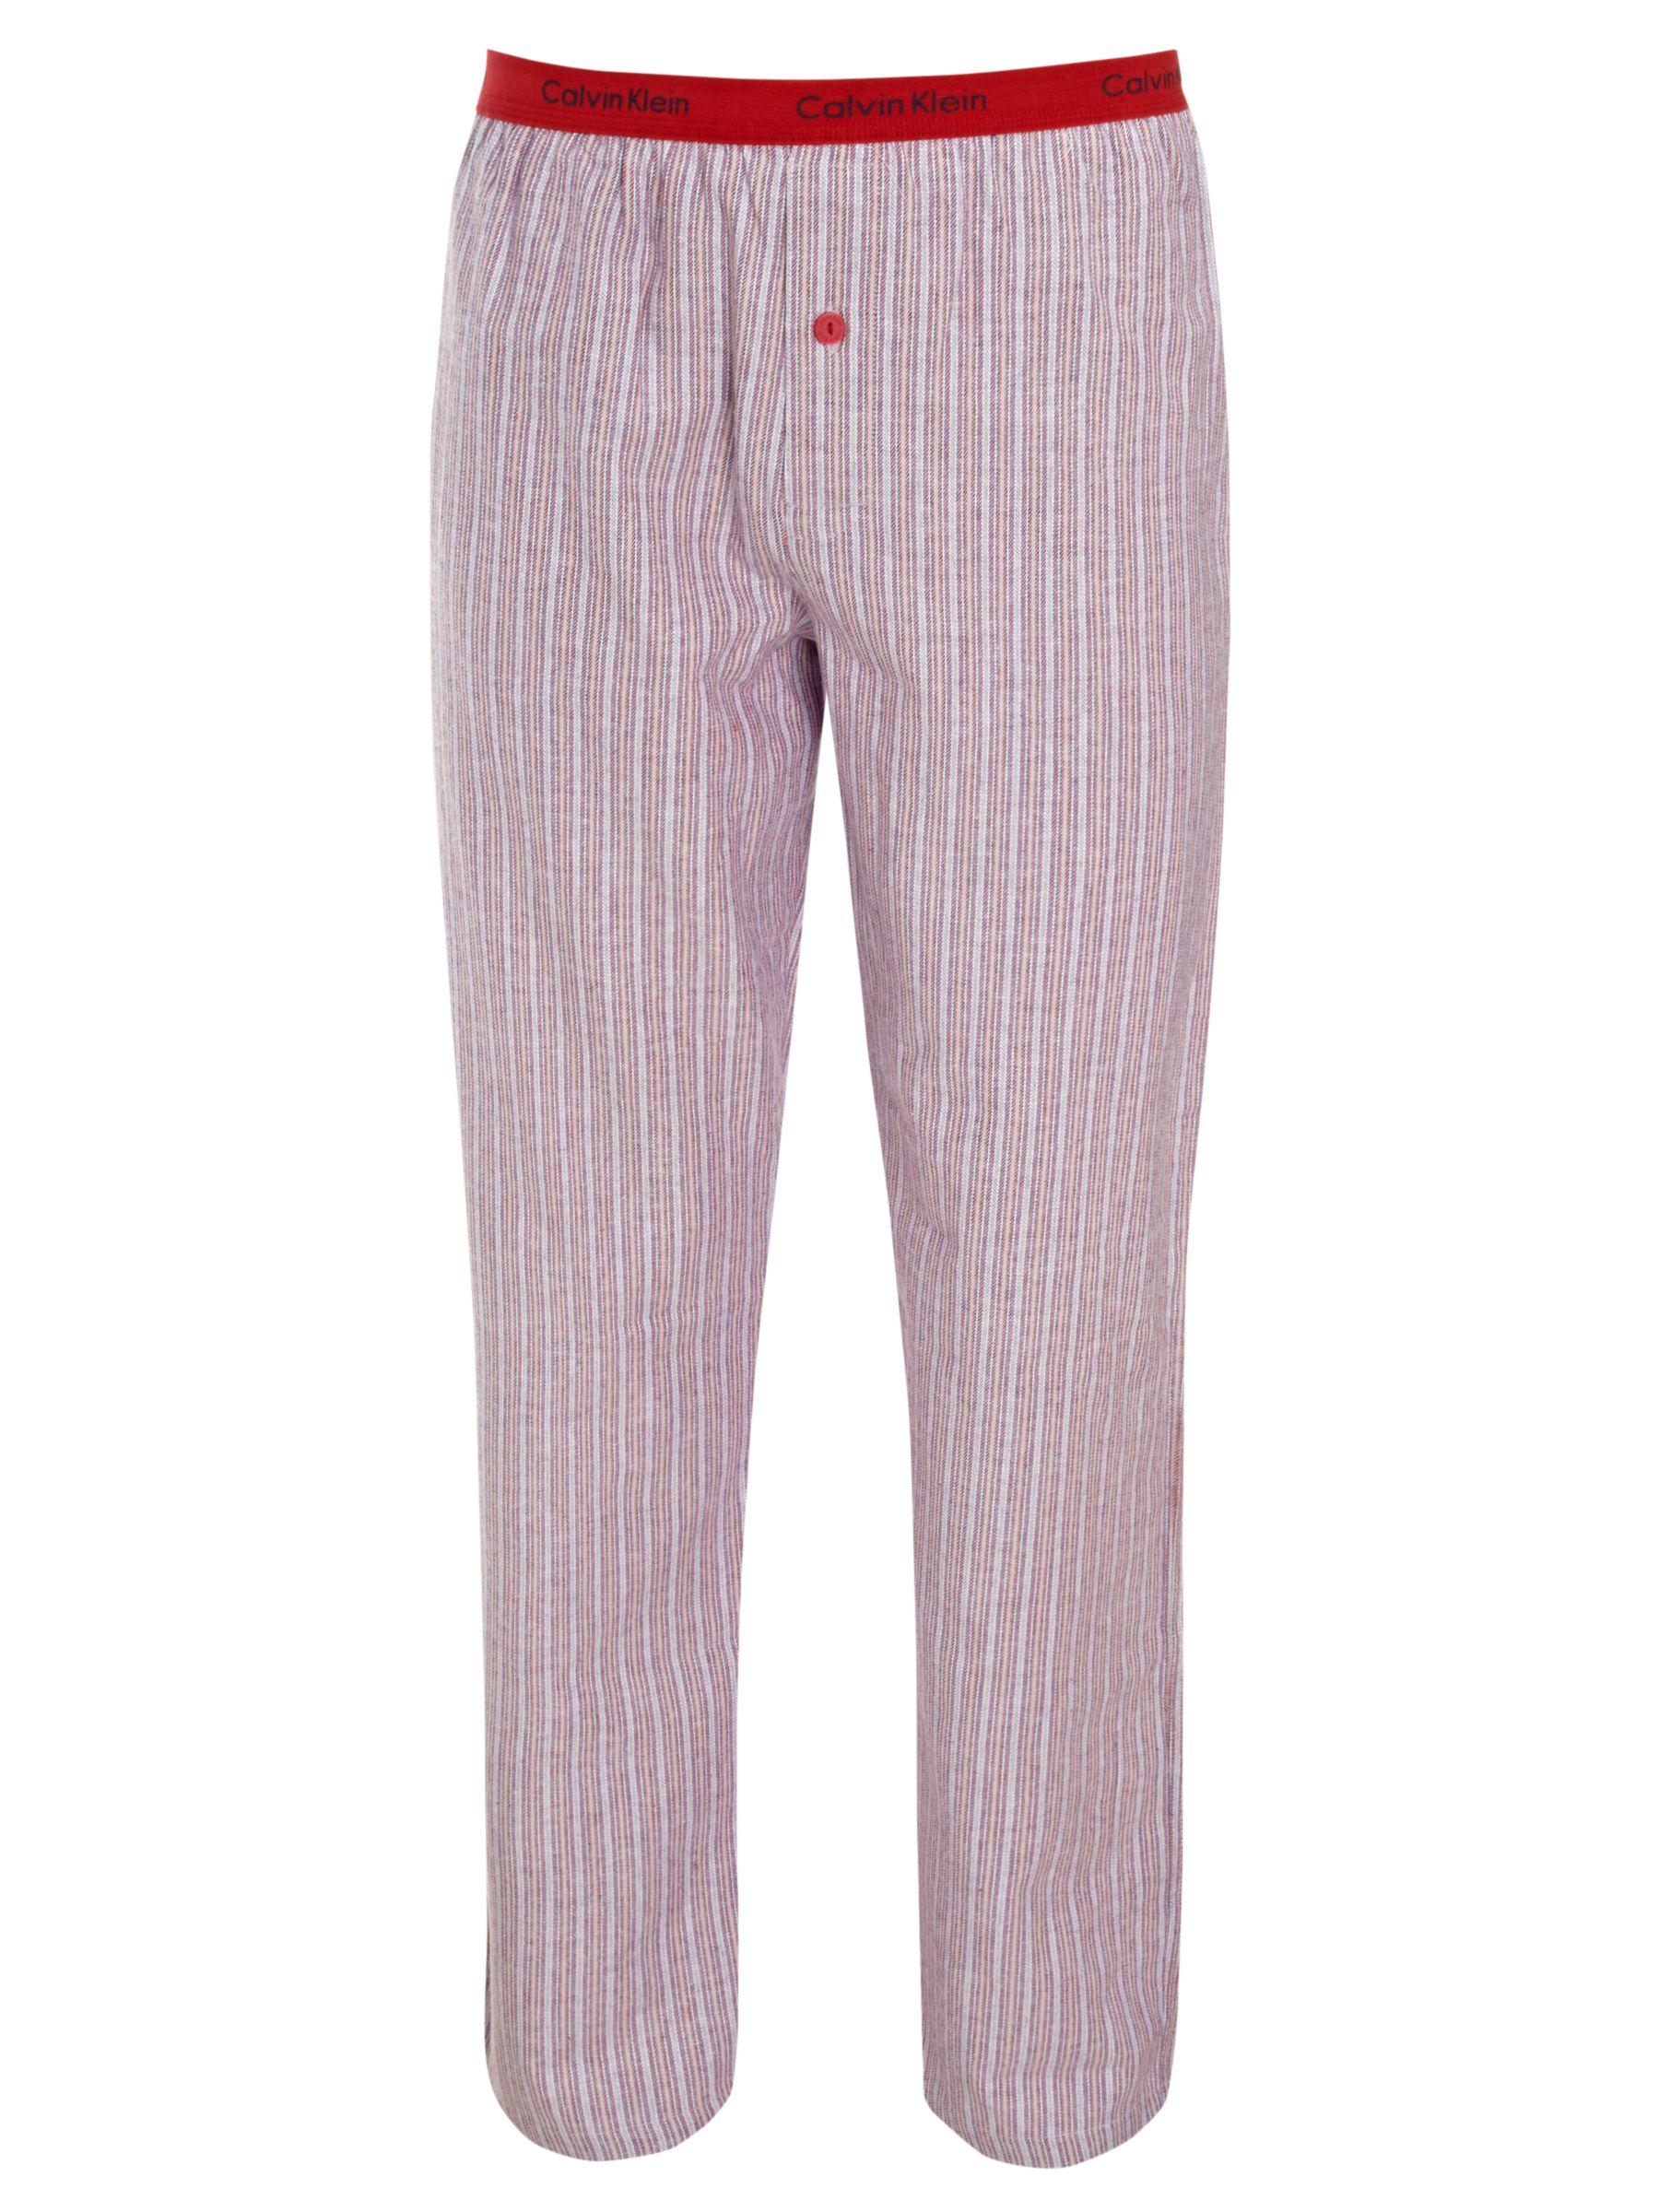 Calvin Klein Flannel Striped Pyjama Pants, Red